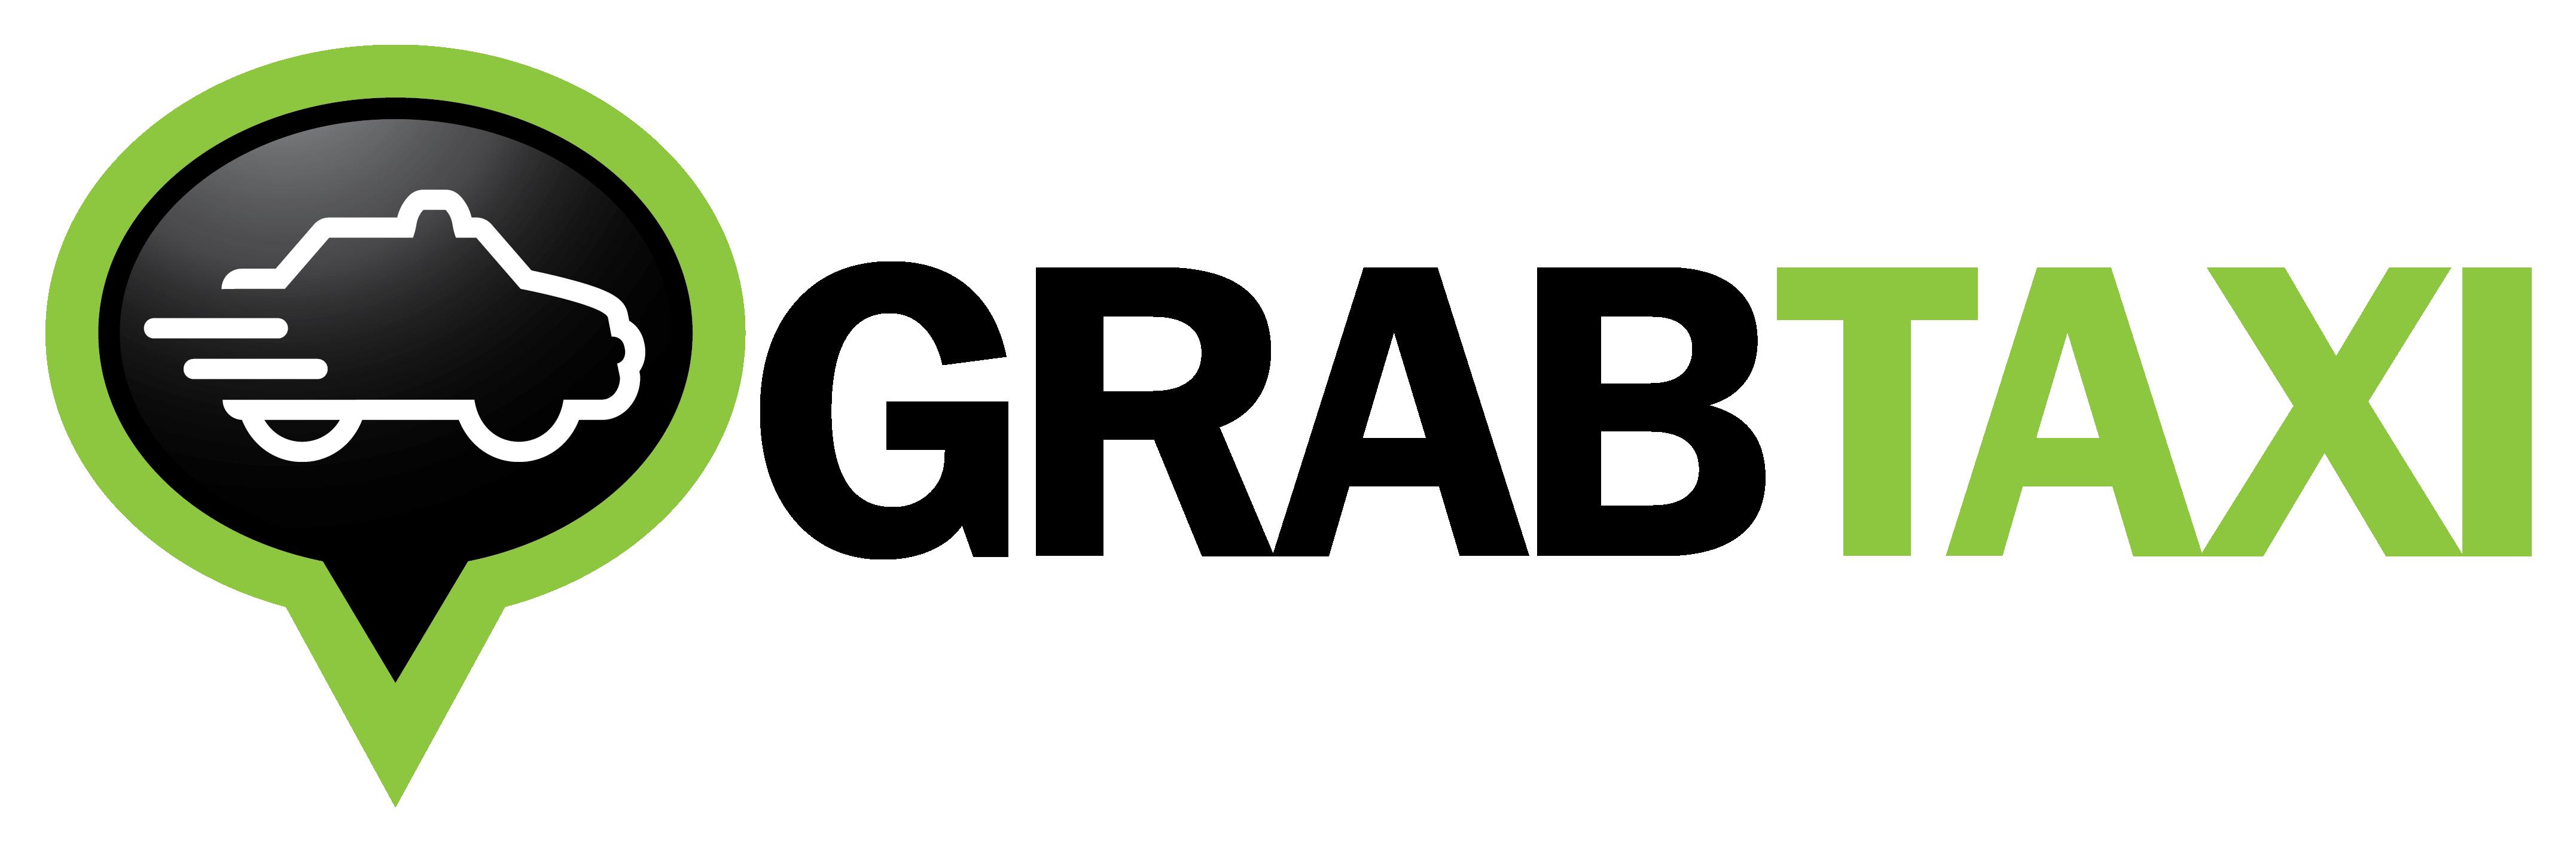 Hd Logo Design Software